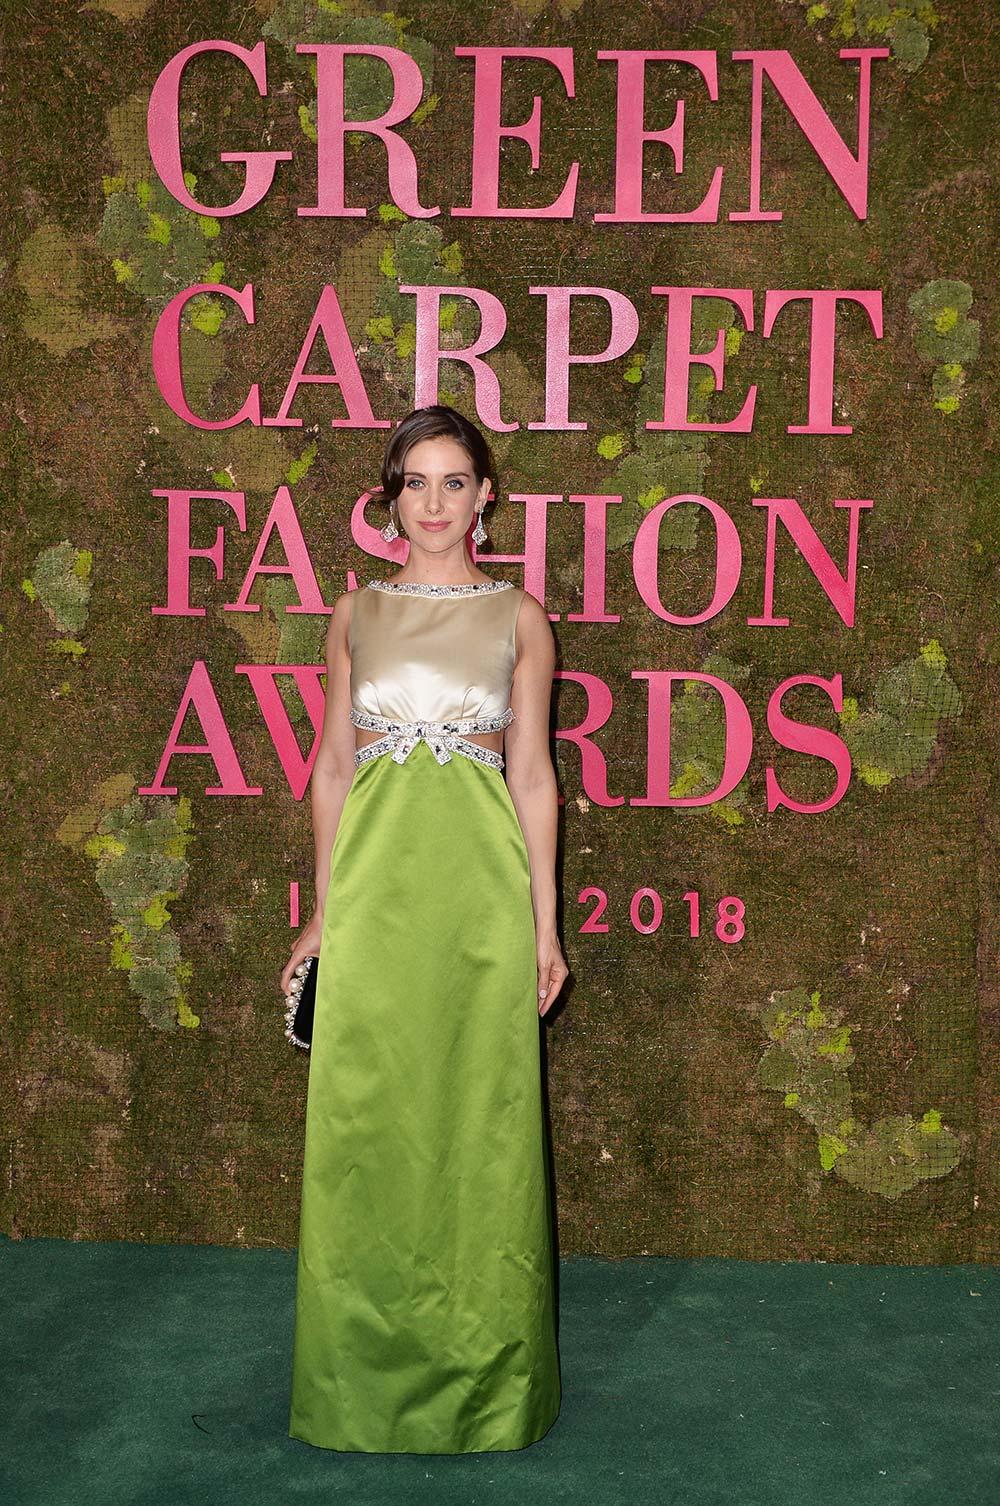 Green Carpet Fashion Awards 2018 - Alison Brie - Hair & Makeup Massimo Serini